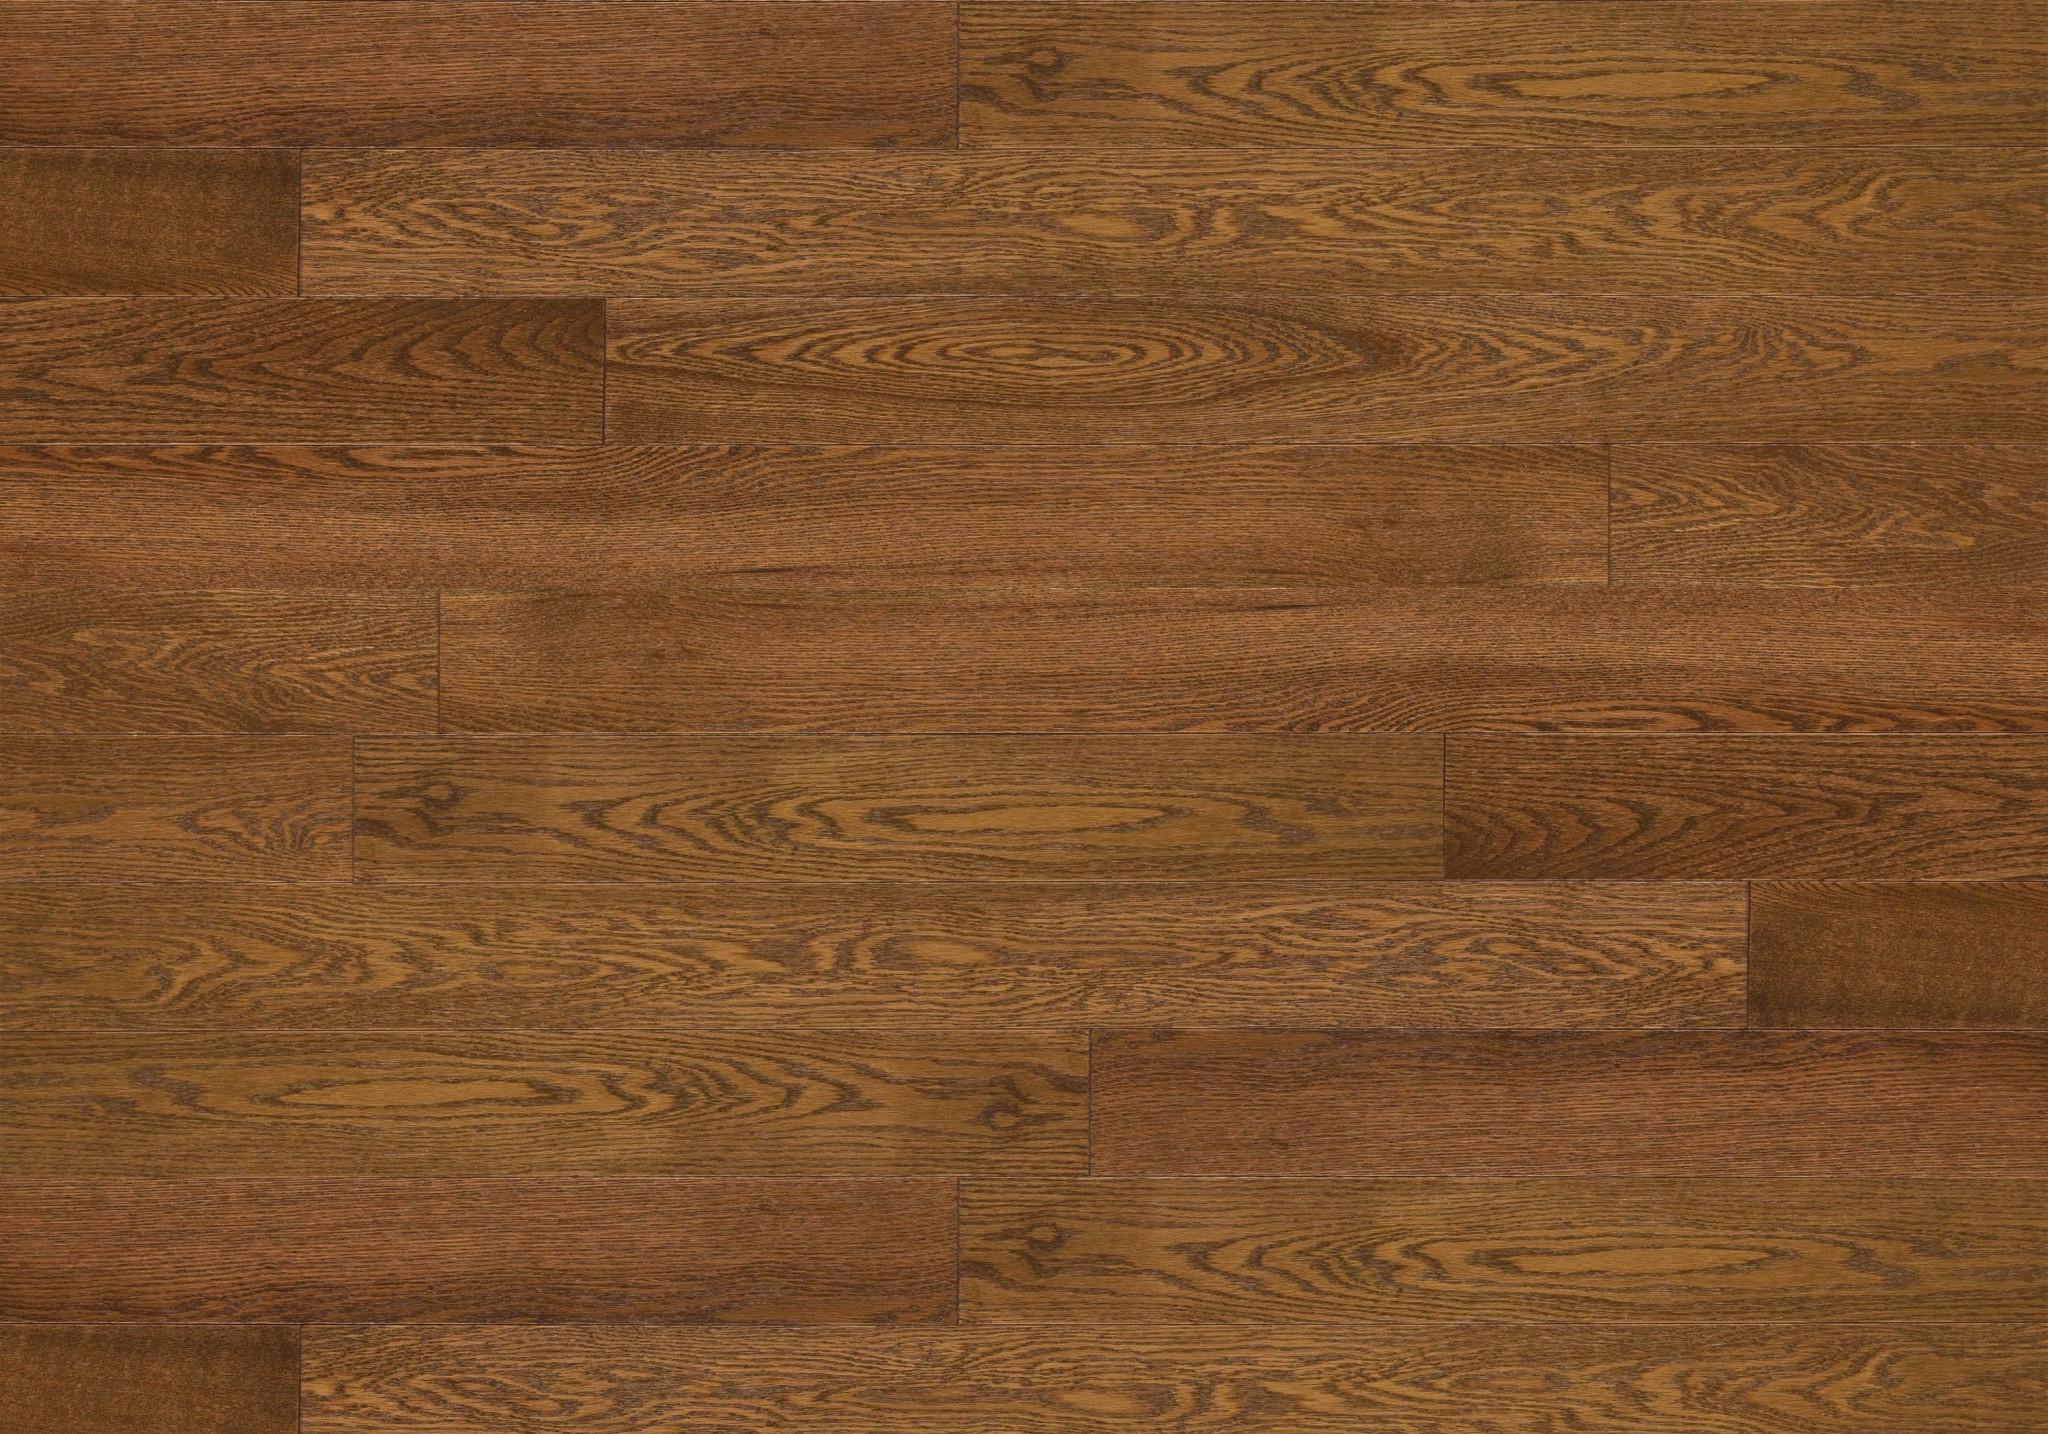 lauzon hardwood flooring distributors of candor ambiance red oak character lauzon hardwood flooring pertaining to hickory hardwood flooring brown madera emira ambiance lauzon